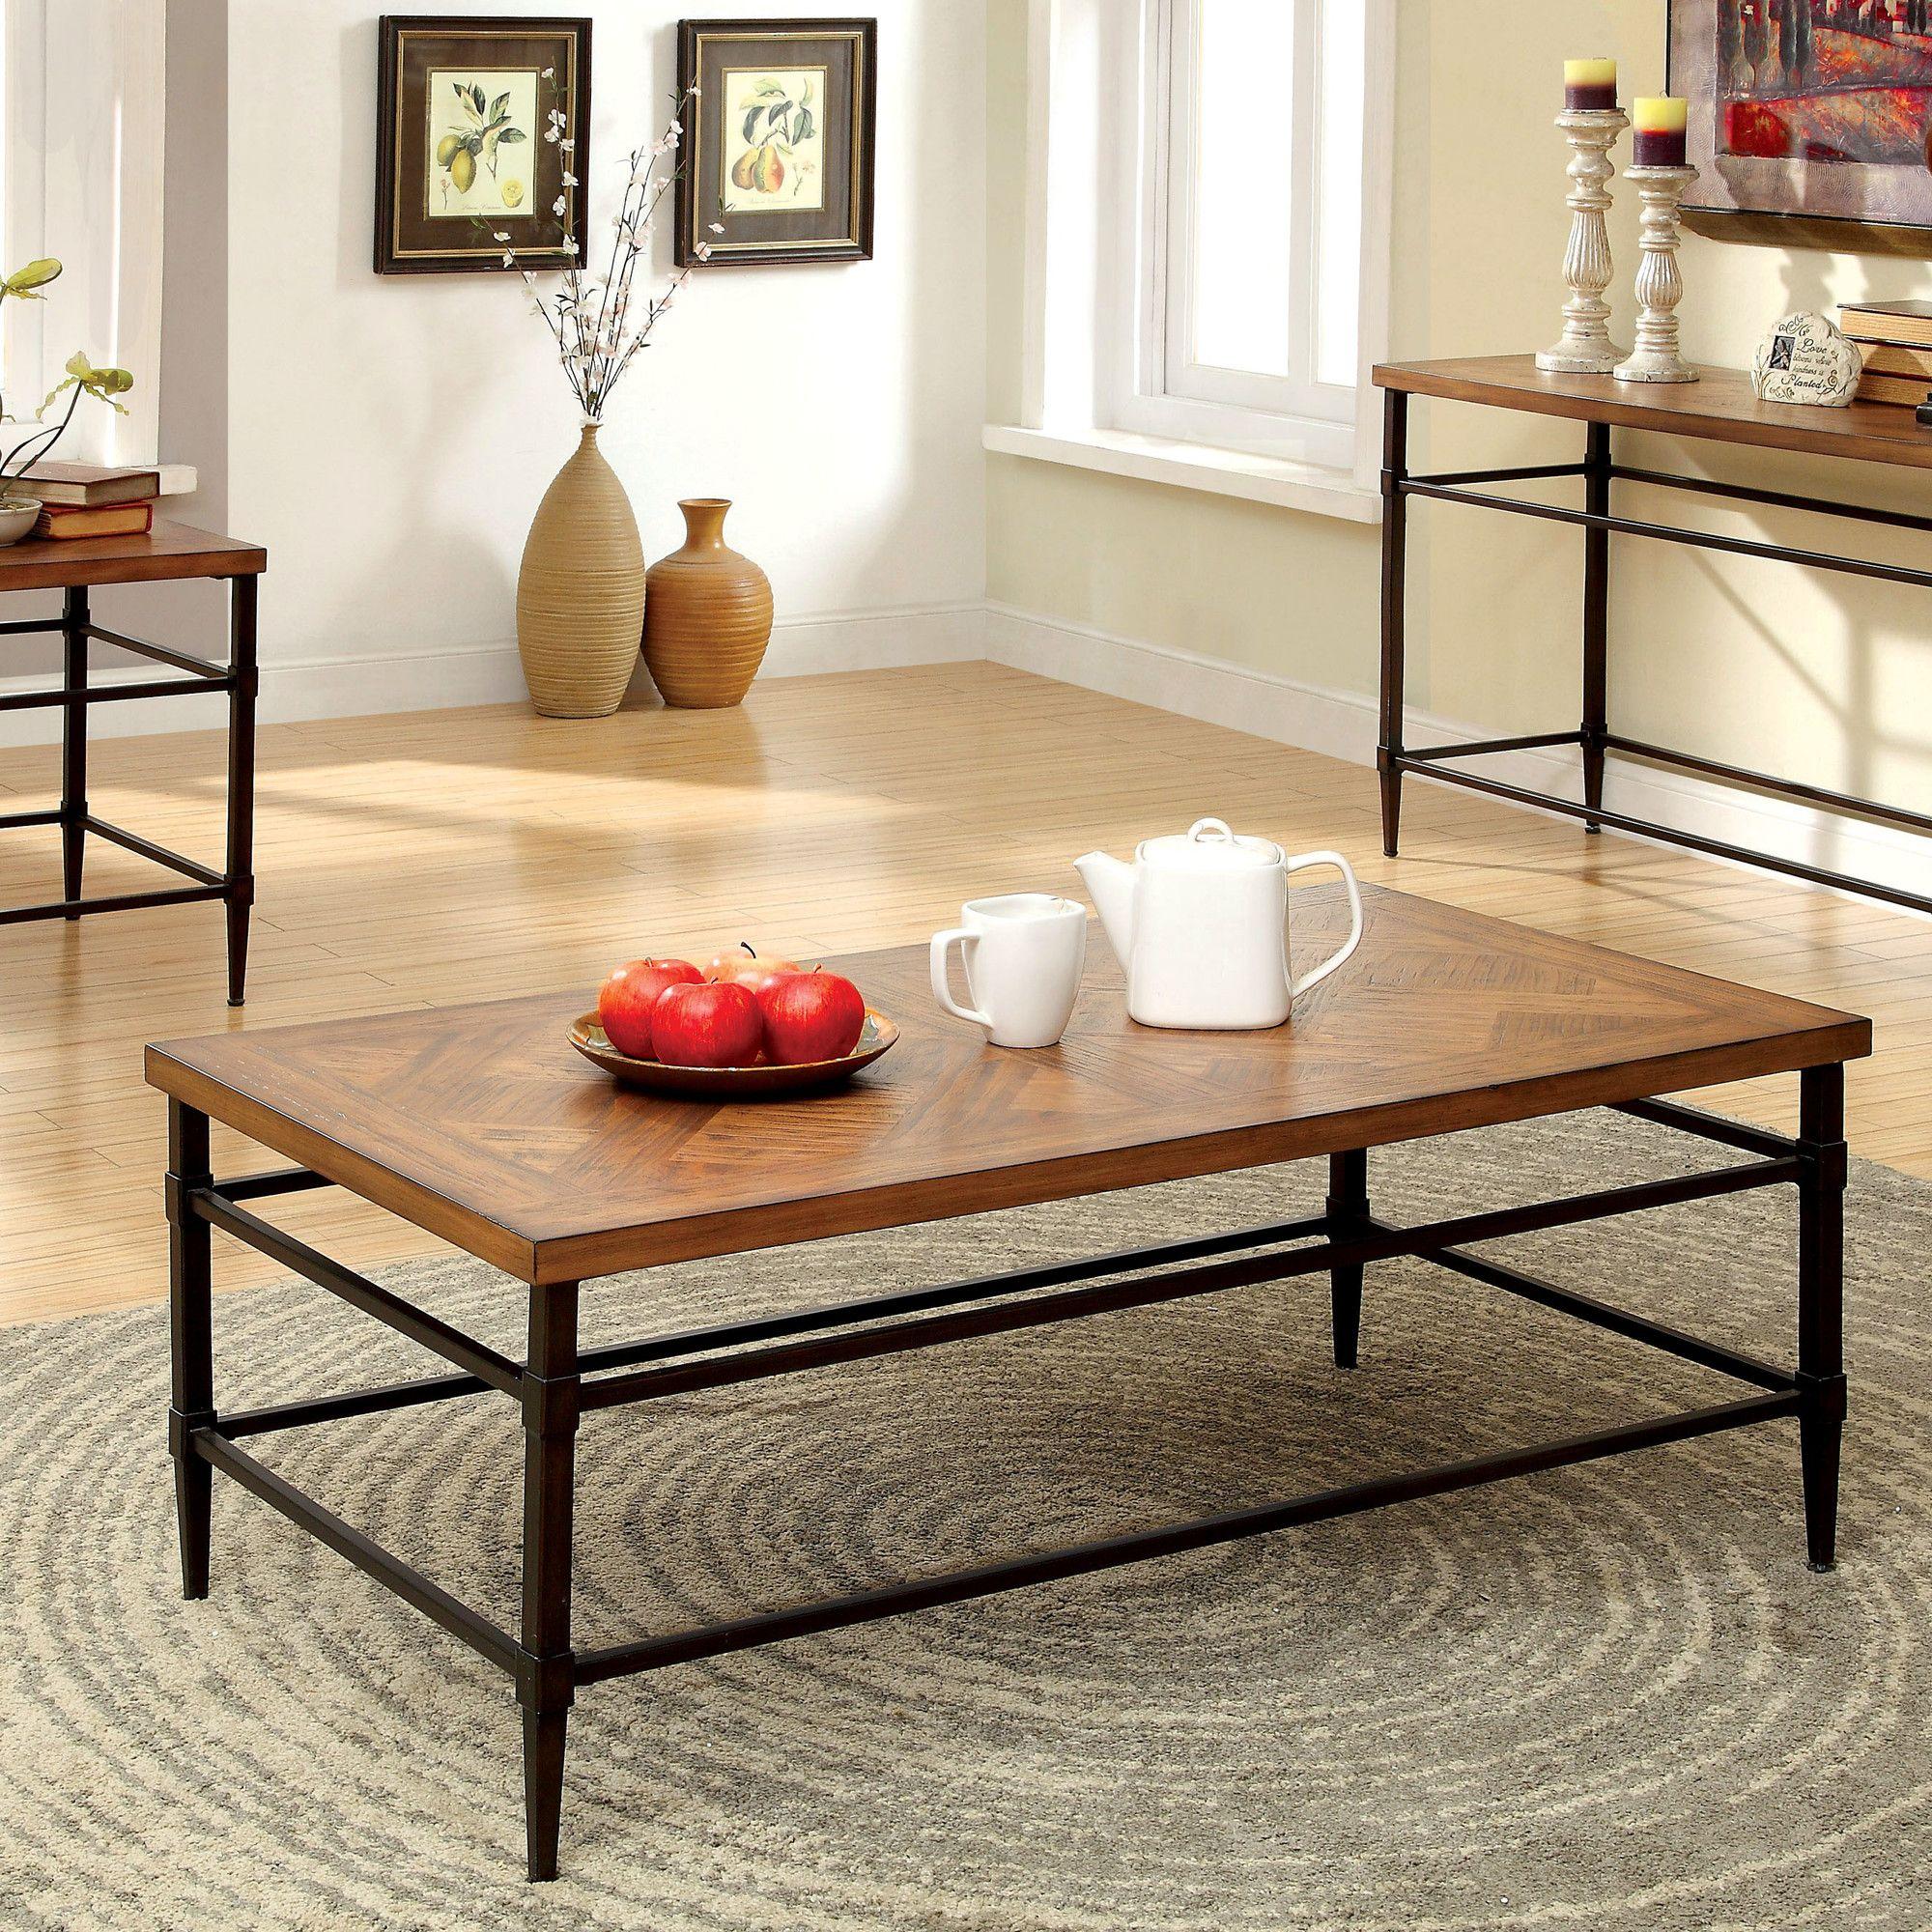 16++ Wayfair rustic coffee table sets ideas